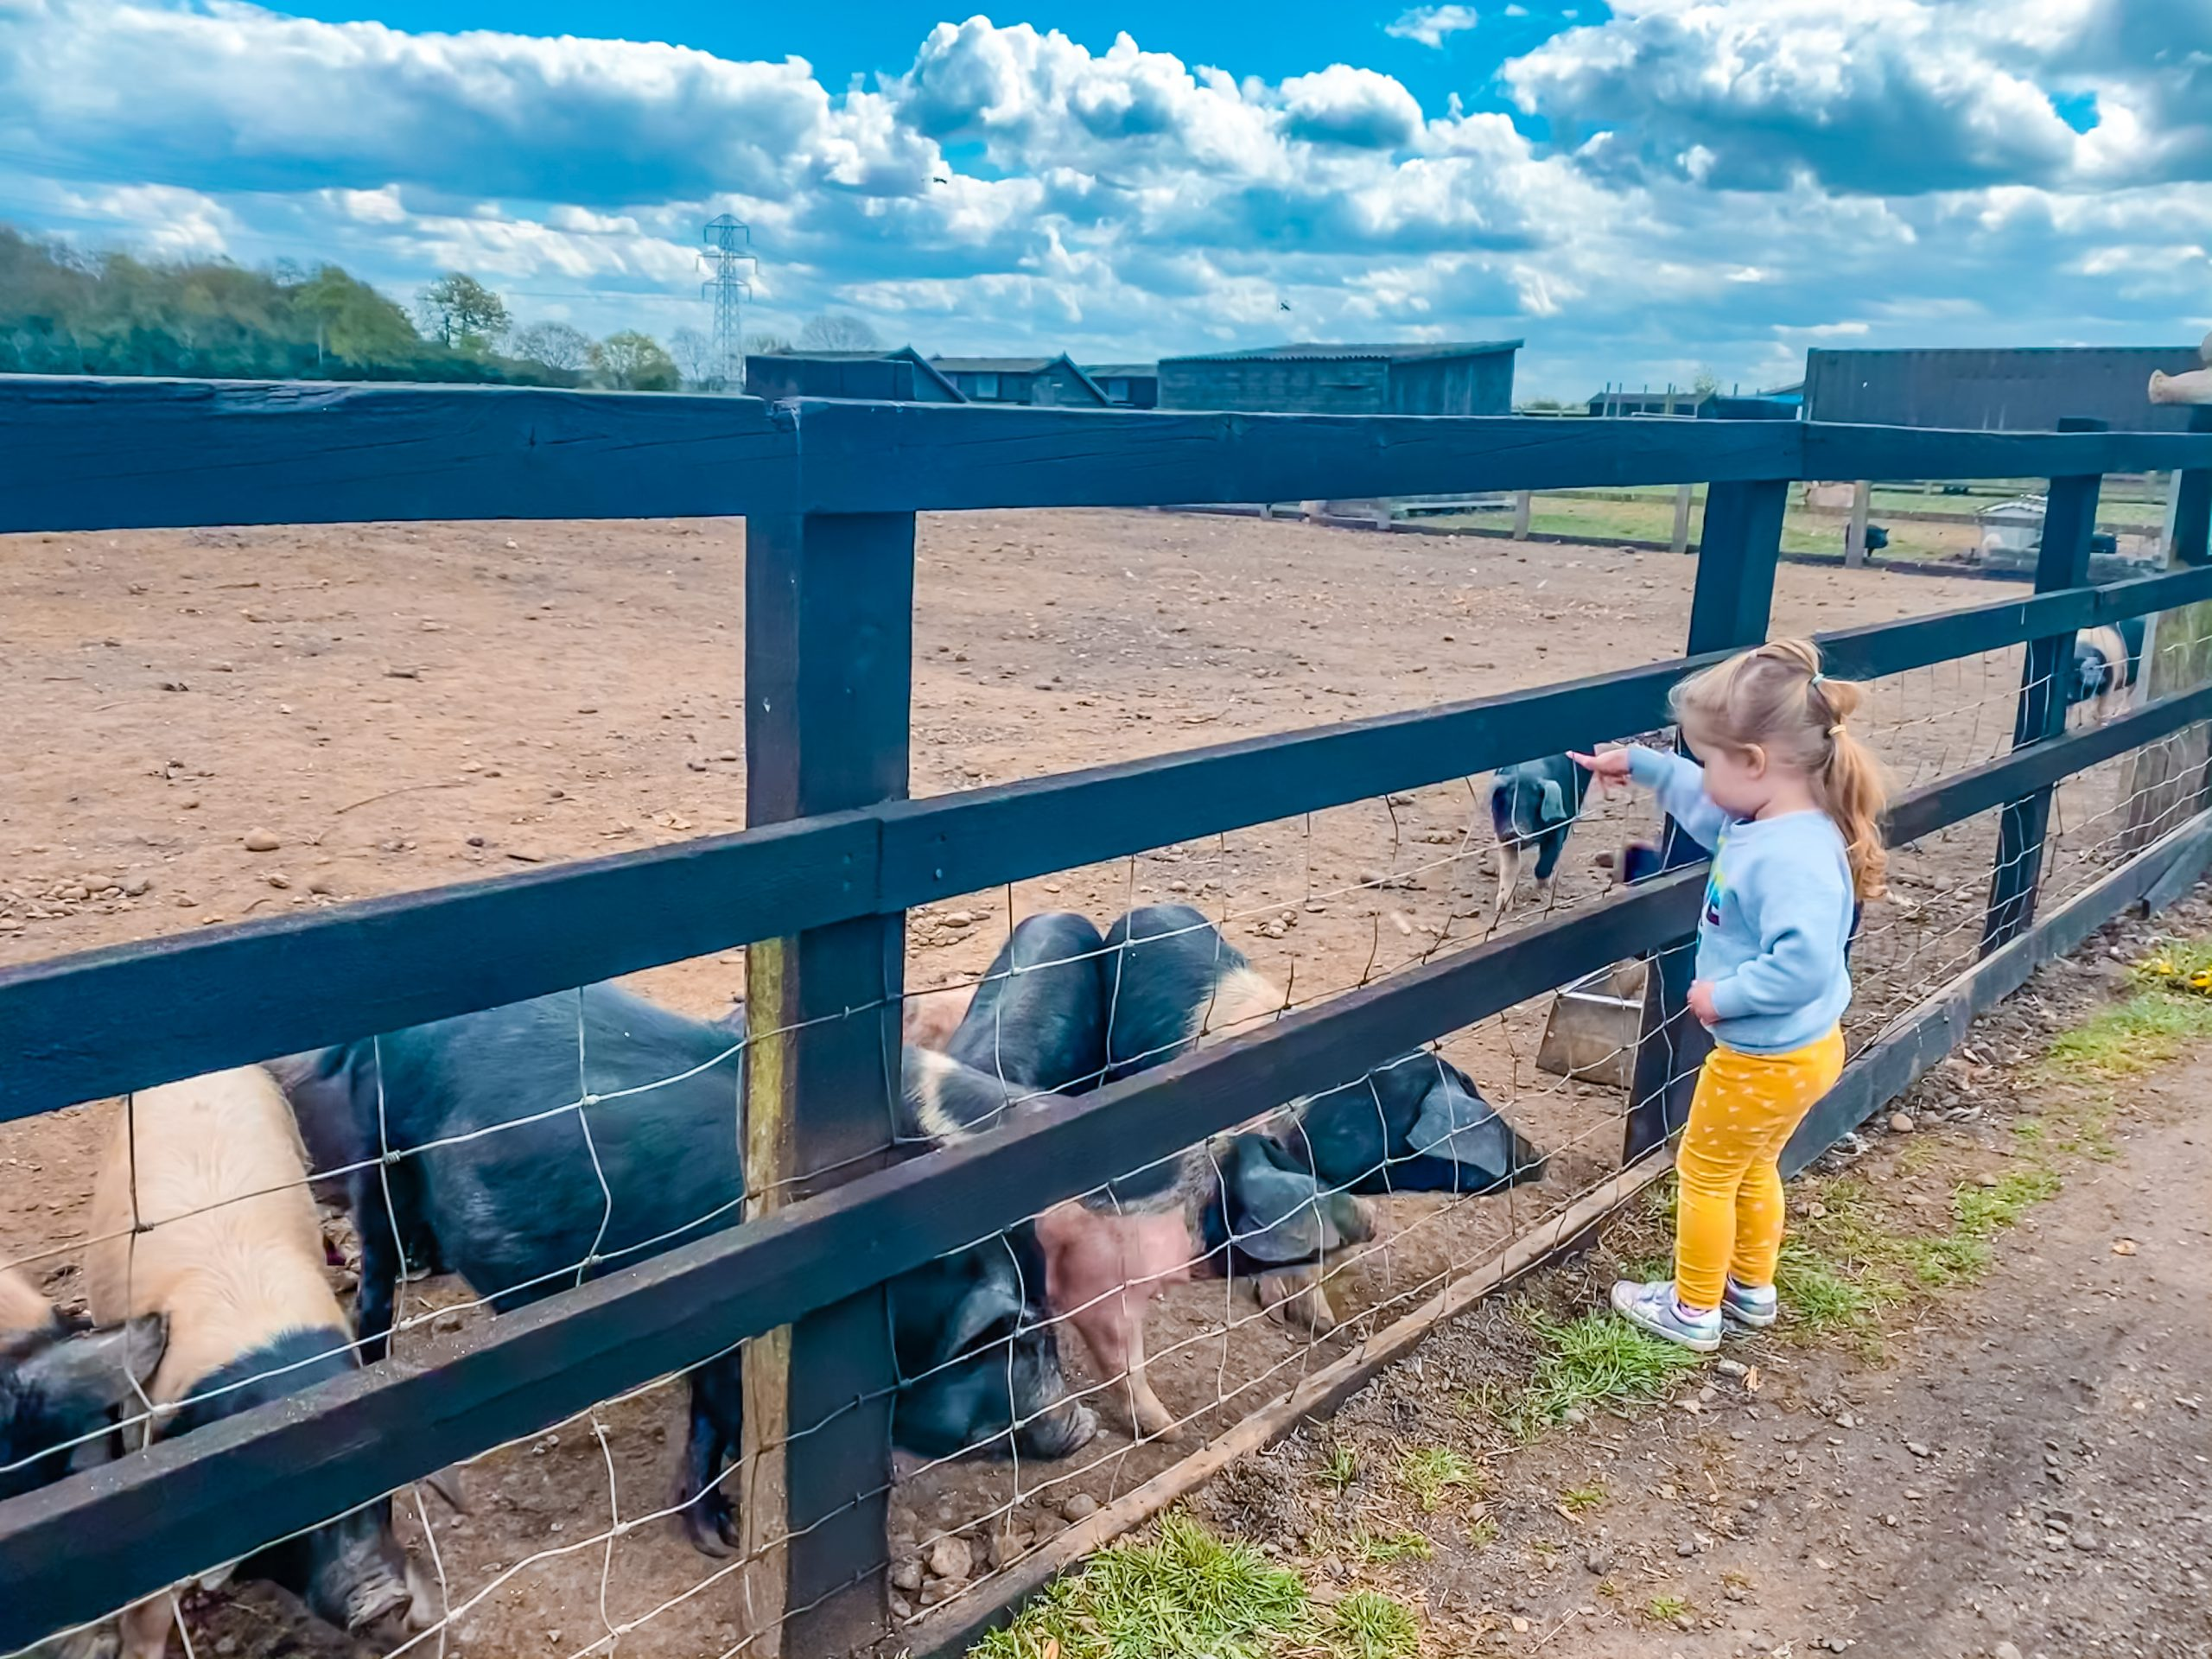 Feeding the pigs at Nathan's Farm